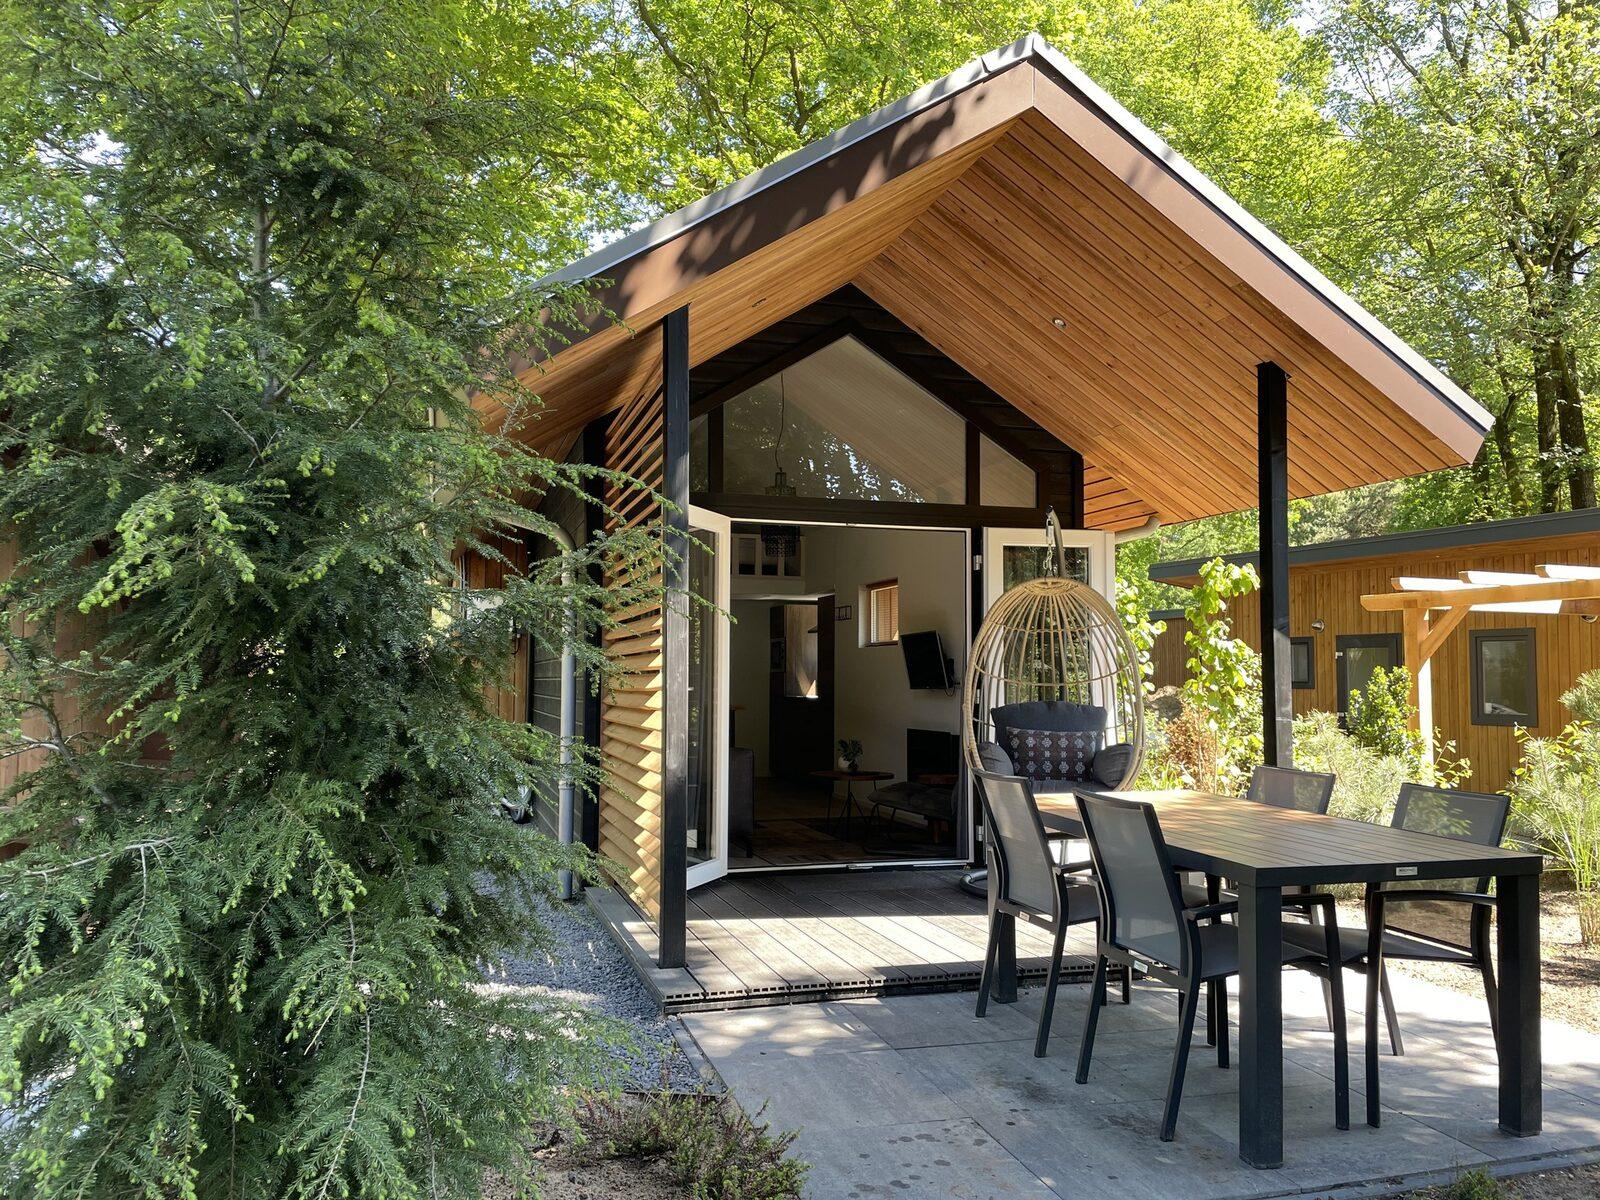 Tiny Lodge Eco 4 Personen (Wellness)